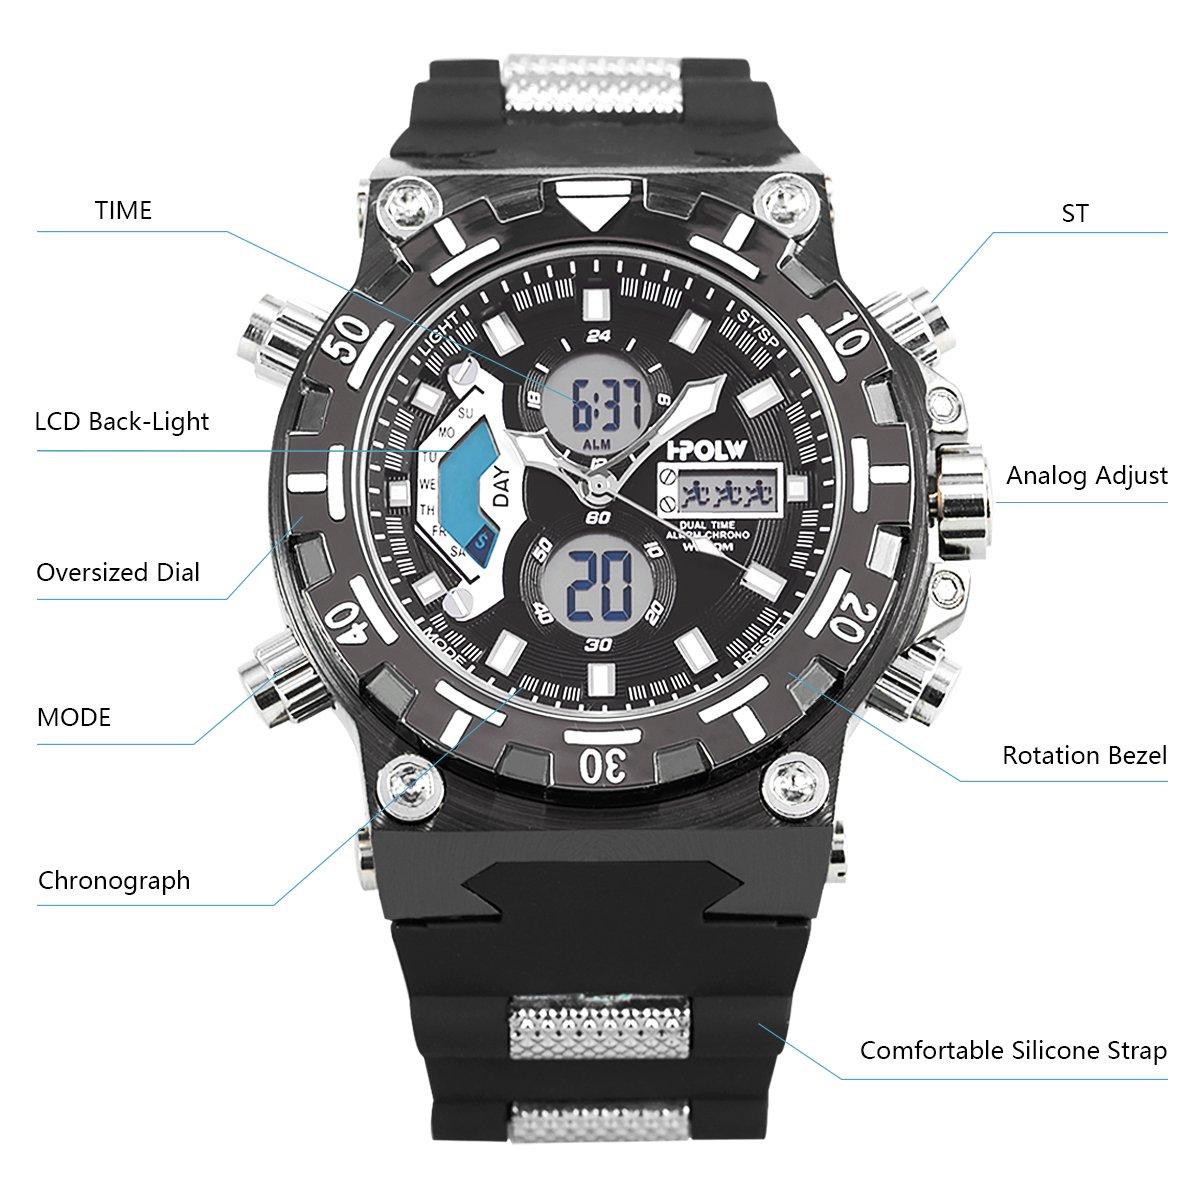 Amazon.com: Sport Watch LED Digital Wrist Large Face LED Waterproof Military SIBOSUN Men Japanese Quartz Alarm Date: Watches